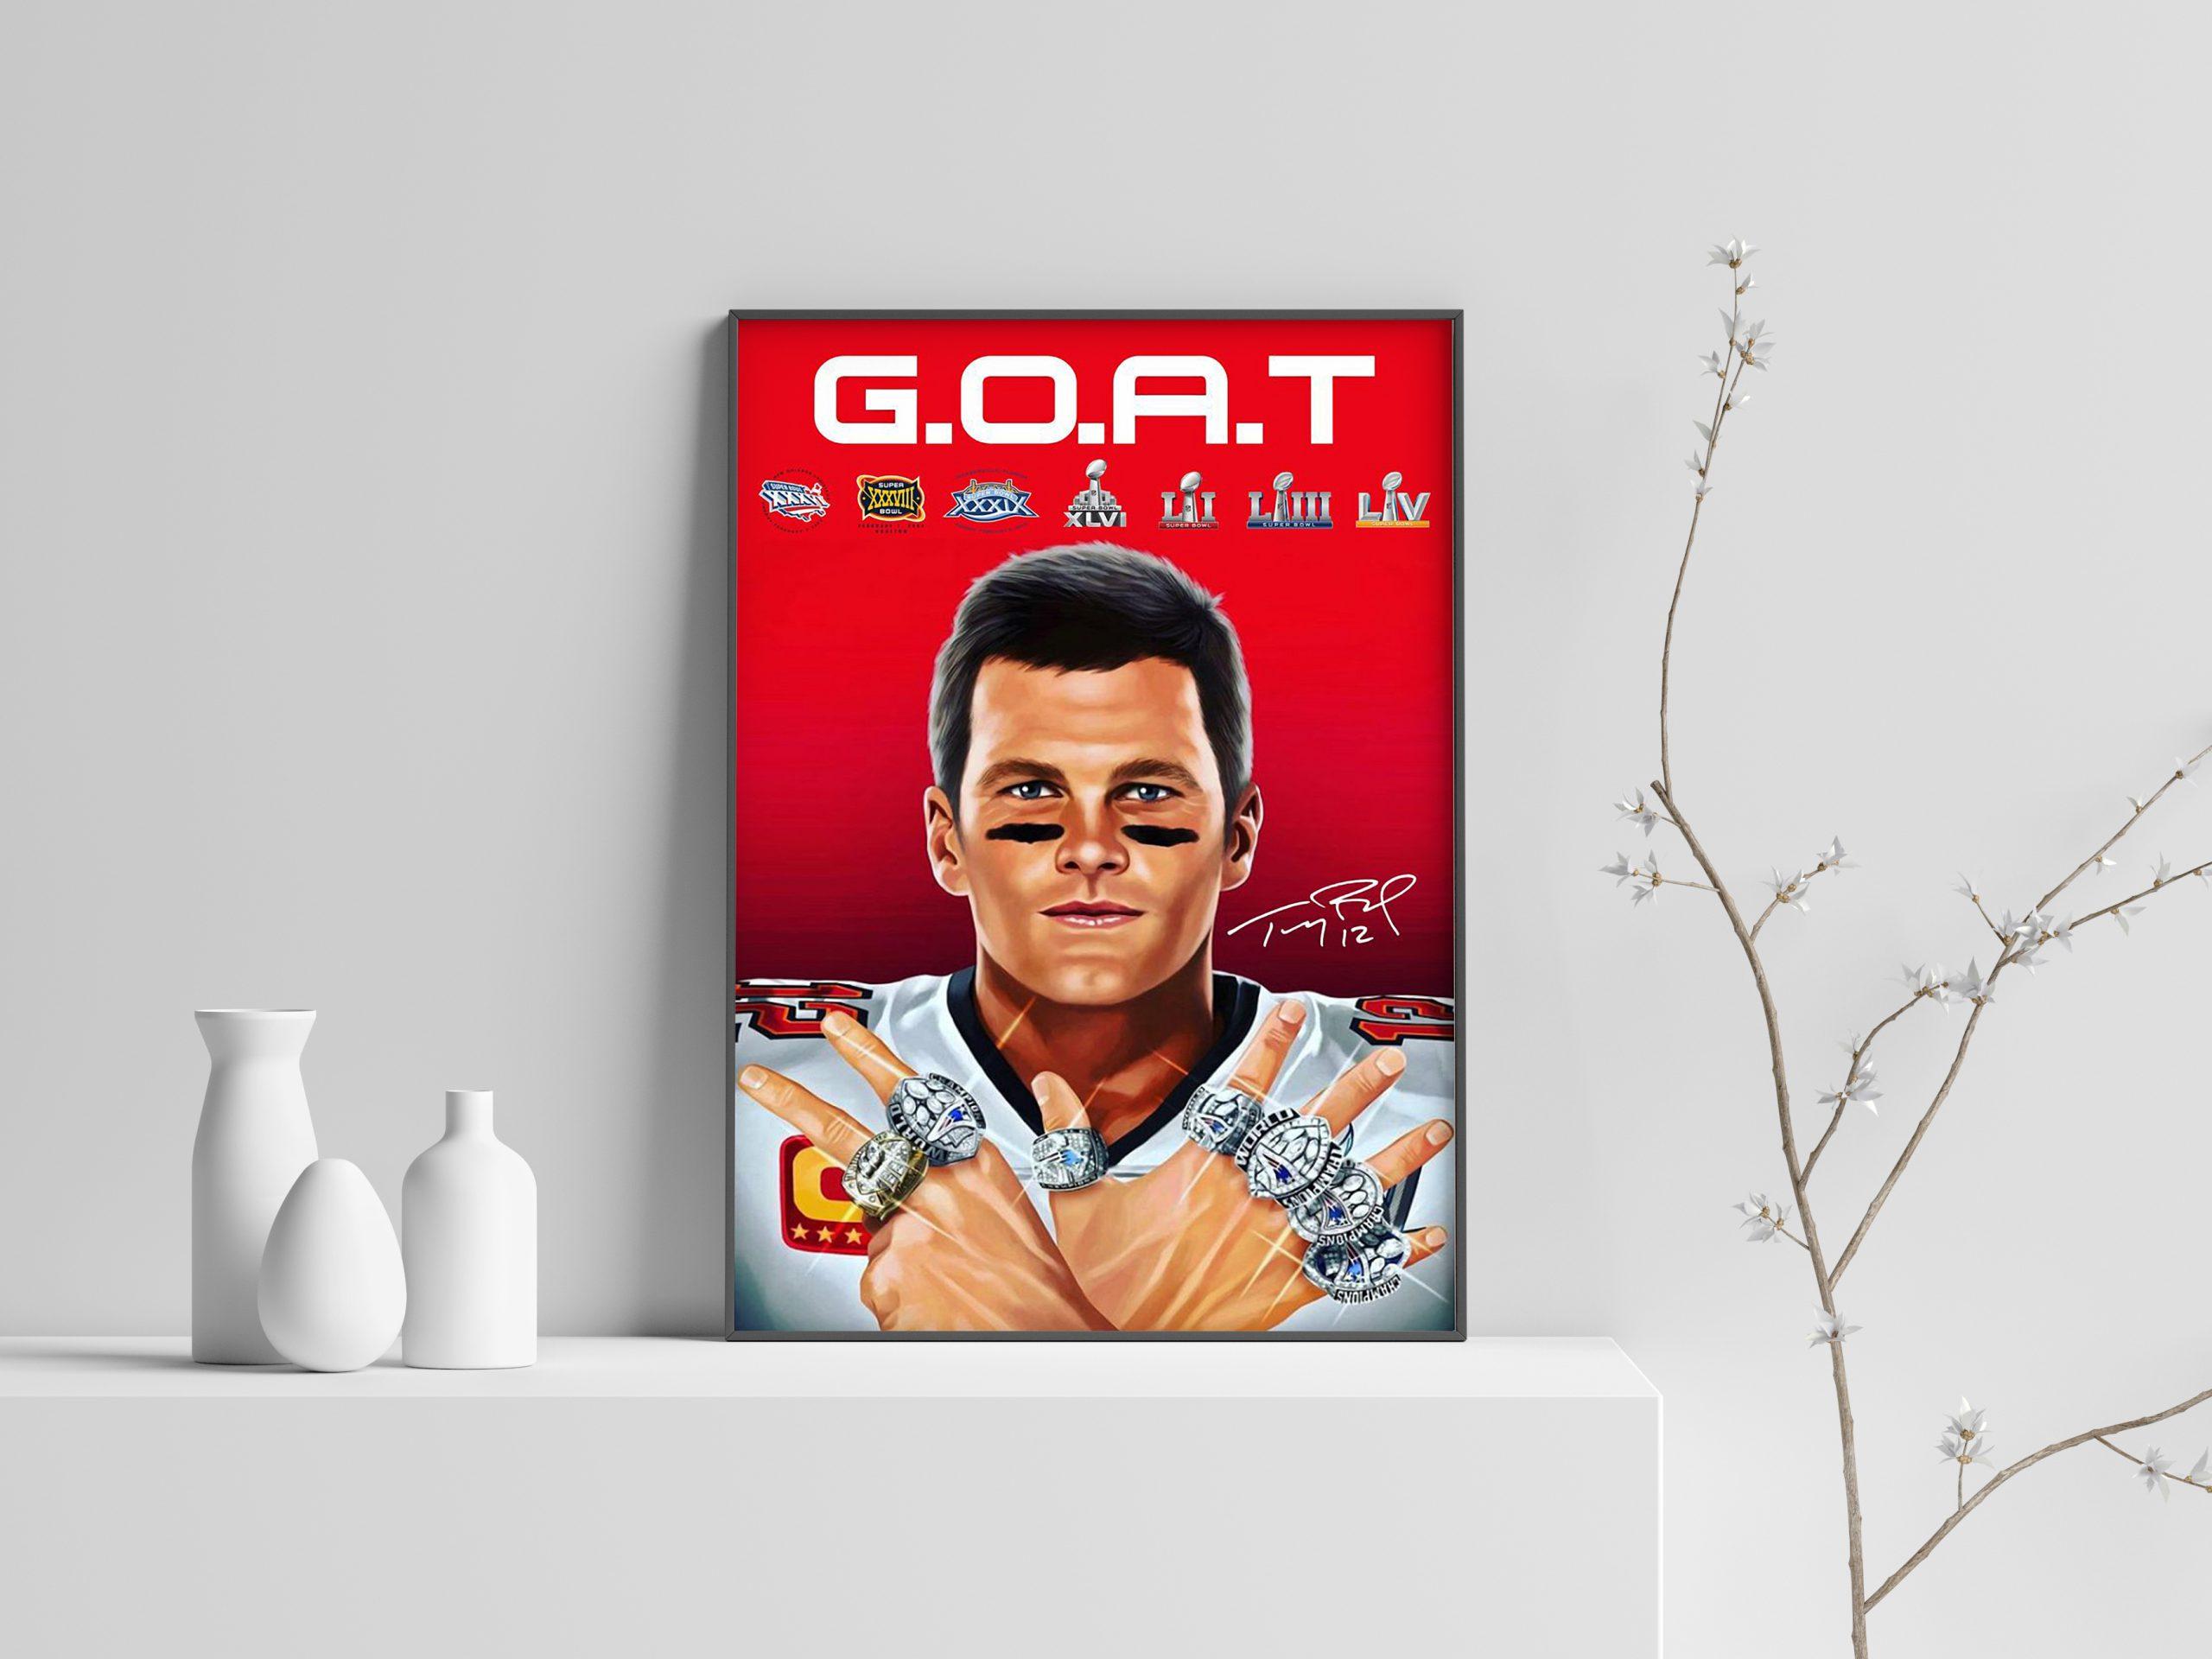 Tom Brady 2021 goat signatures poster